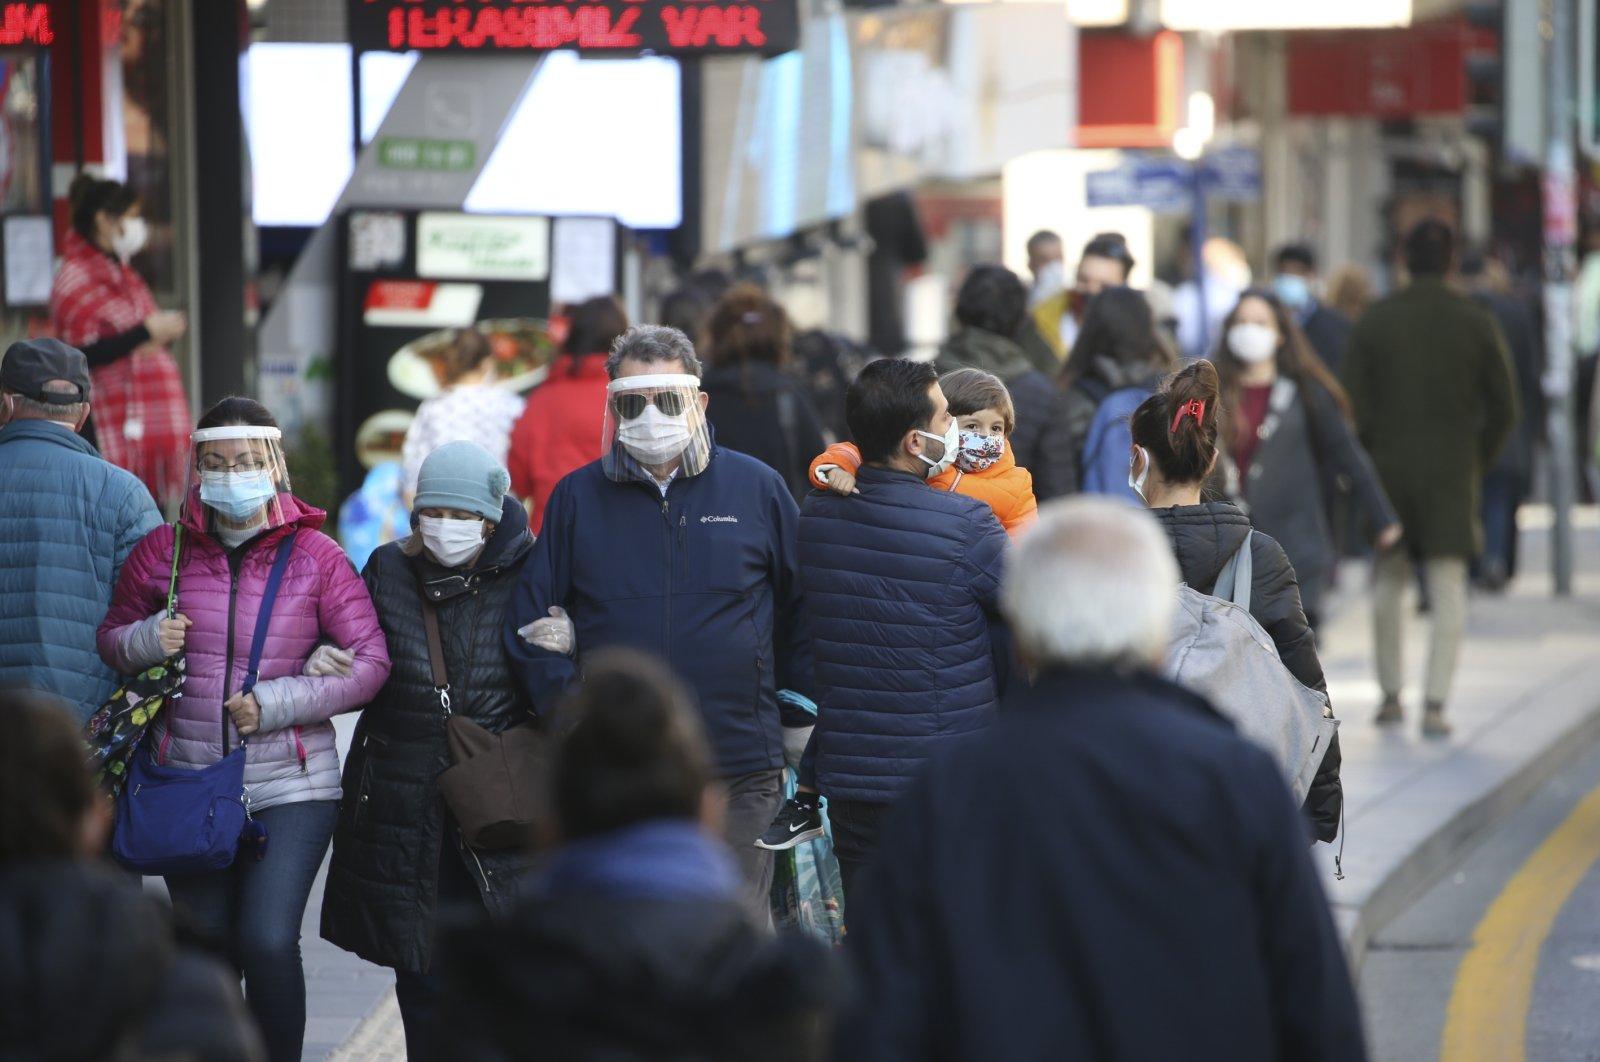 People wearing masks and face shields walk on a street in the capital Ankara, Turkey, Nov. 13, 2020. (AA Photo)